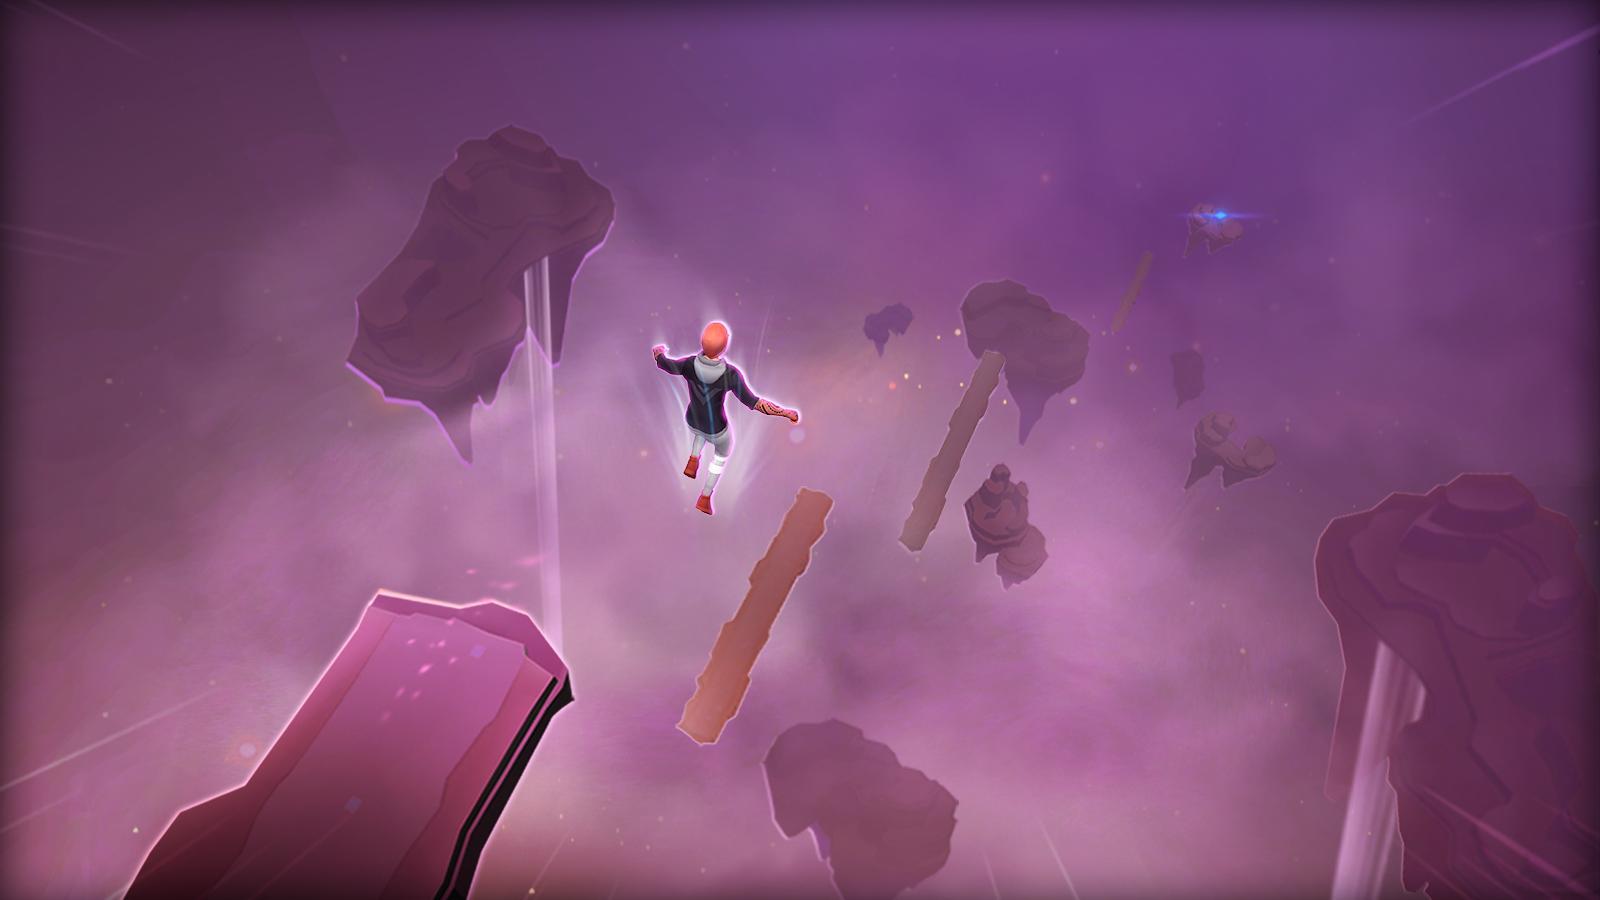 Sky Dancer Run - Running Game 4.2.0 Screenshot 7